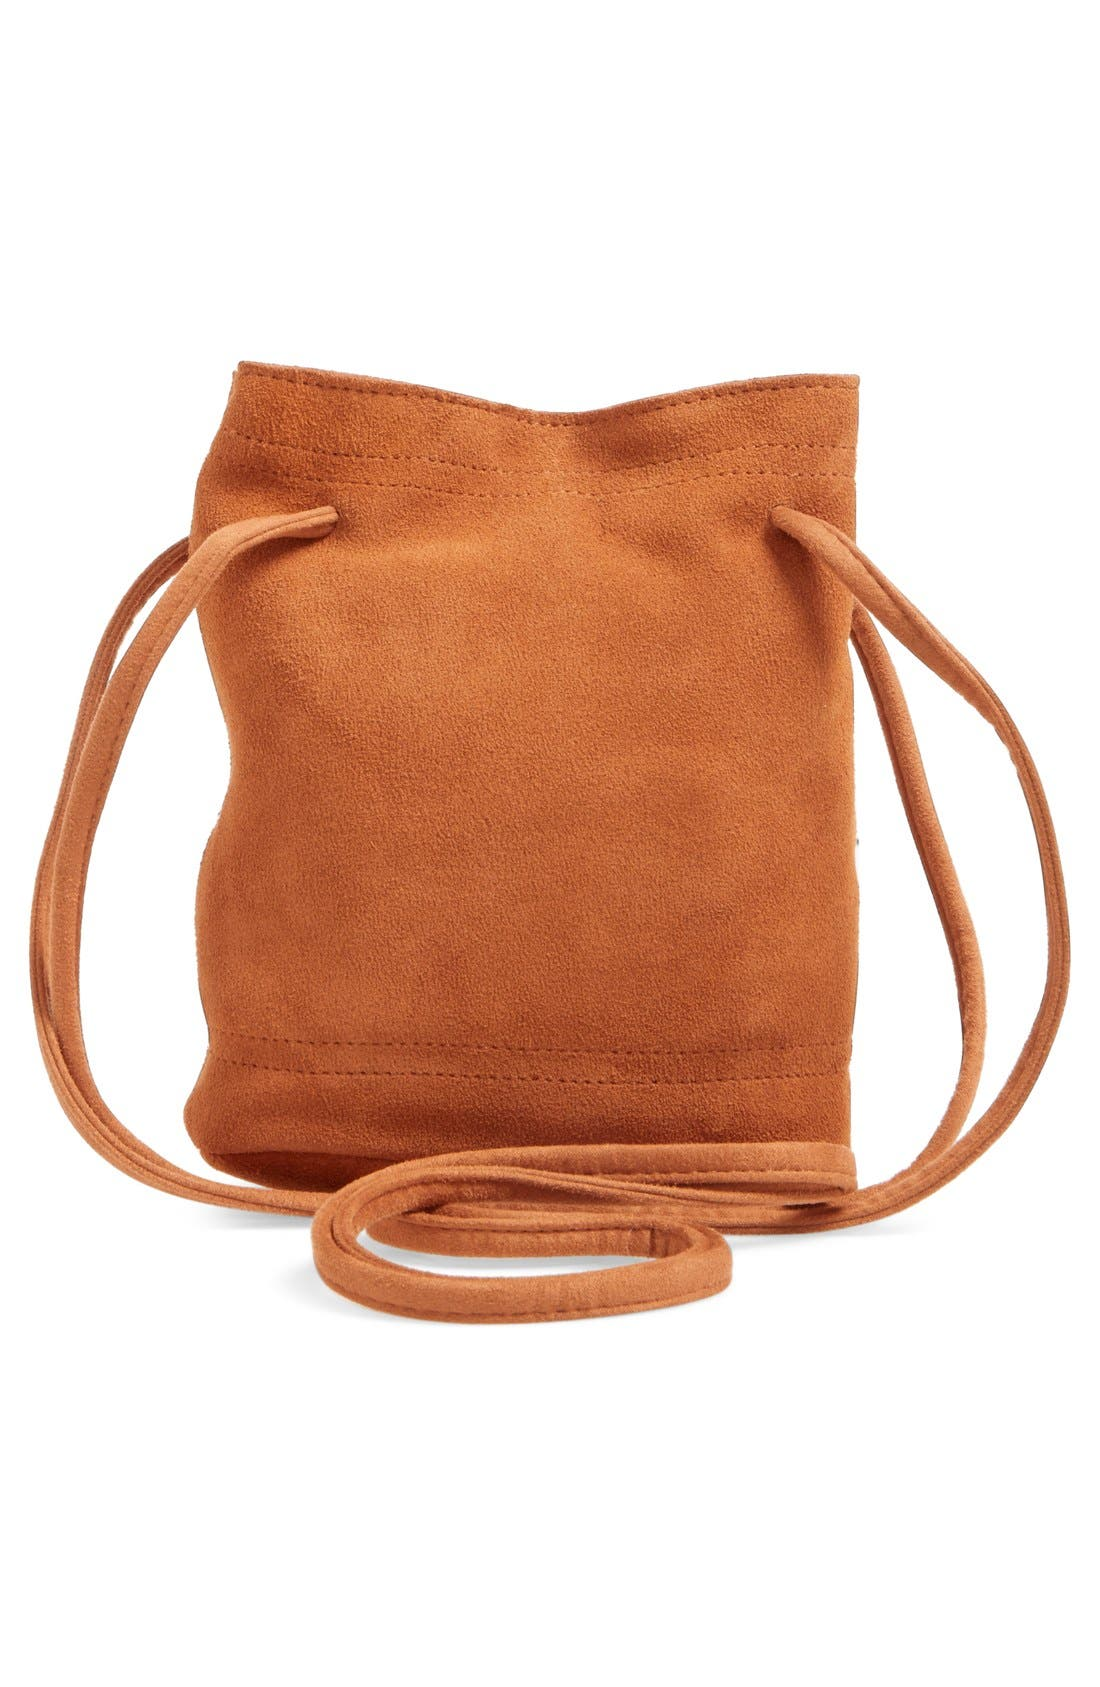 Alternate Image 3  - Street Level Suede Crossbody Bag